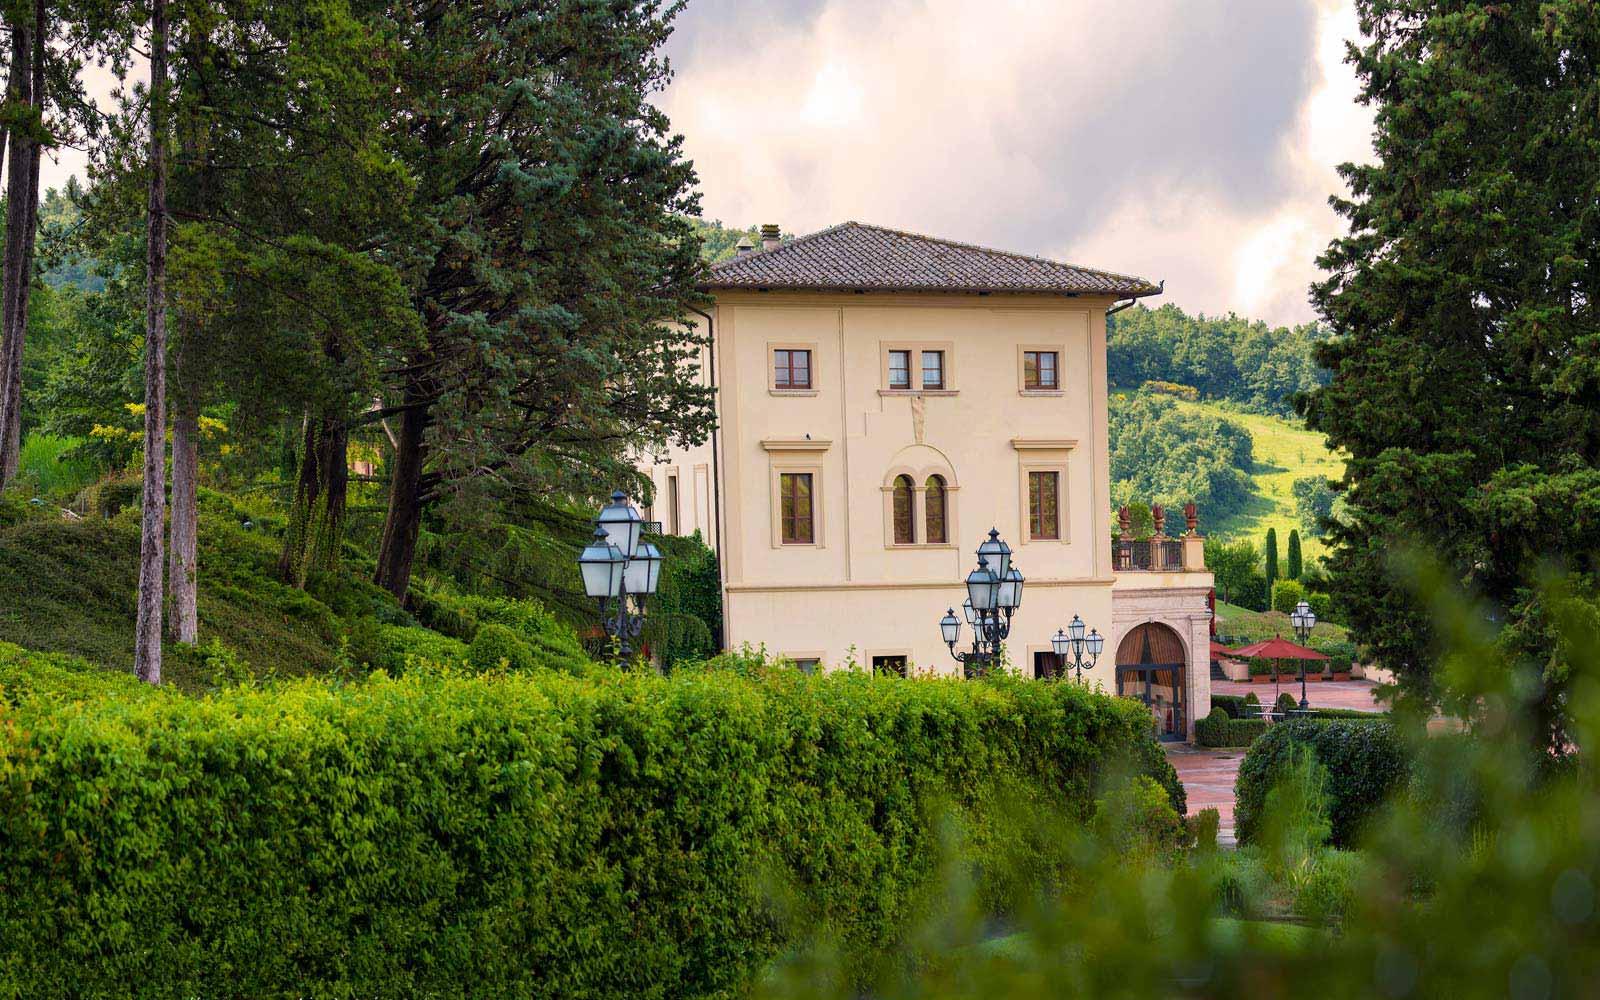 Fonteverde The Medici Palace